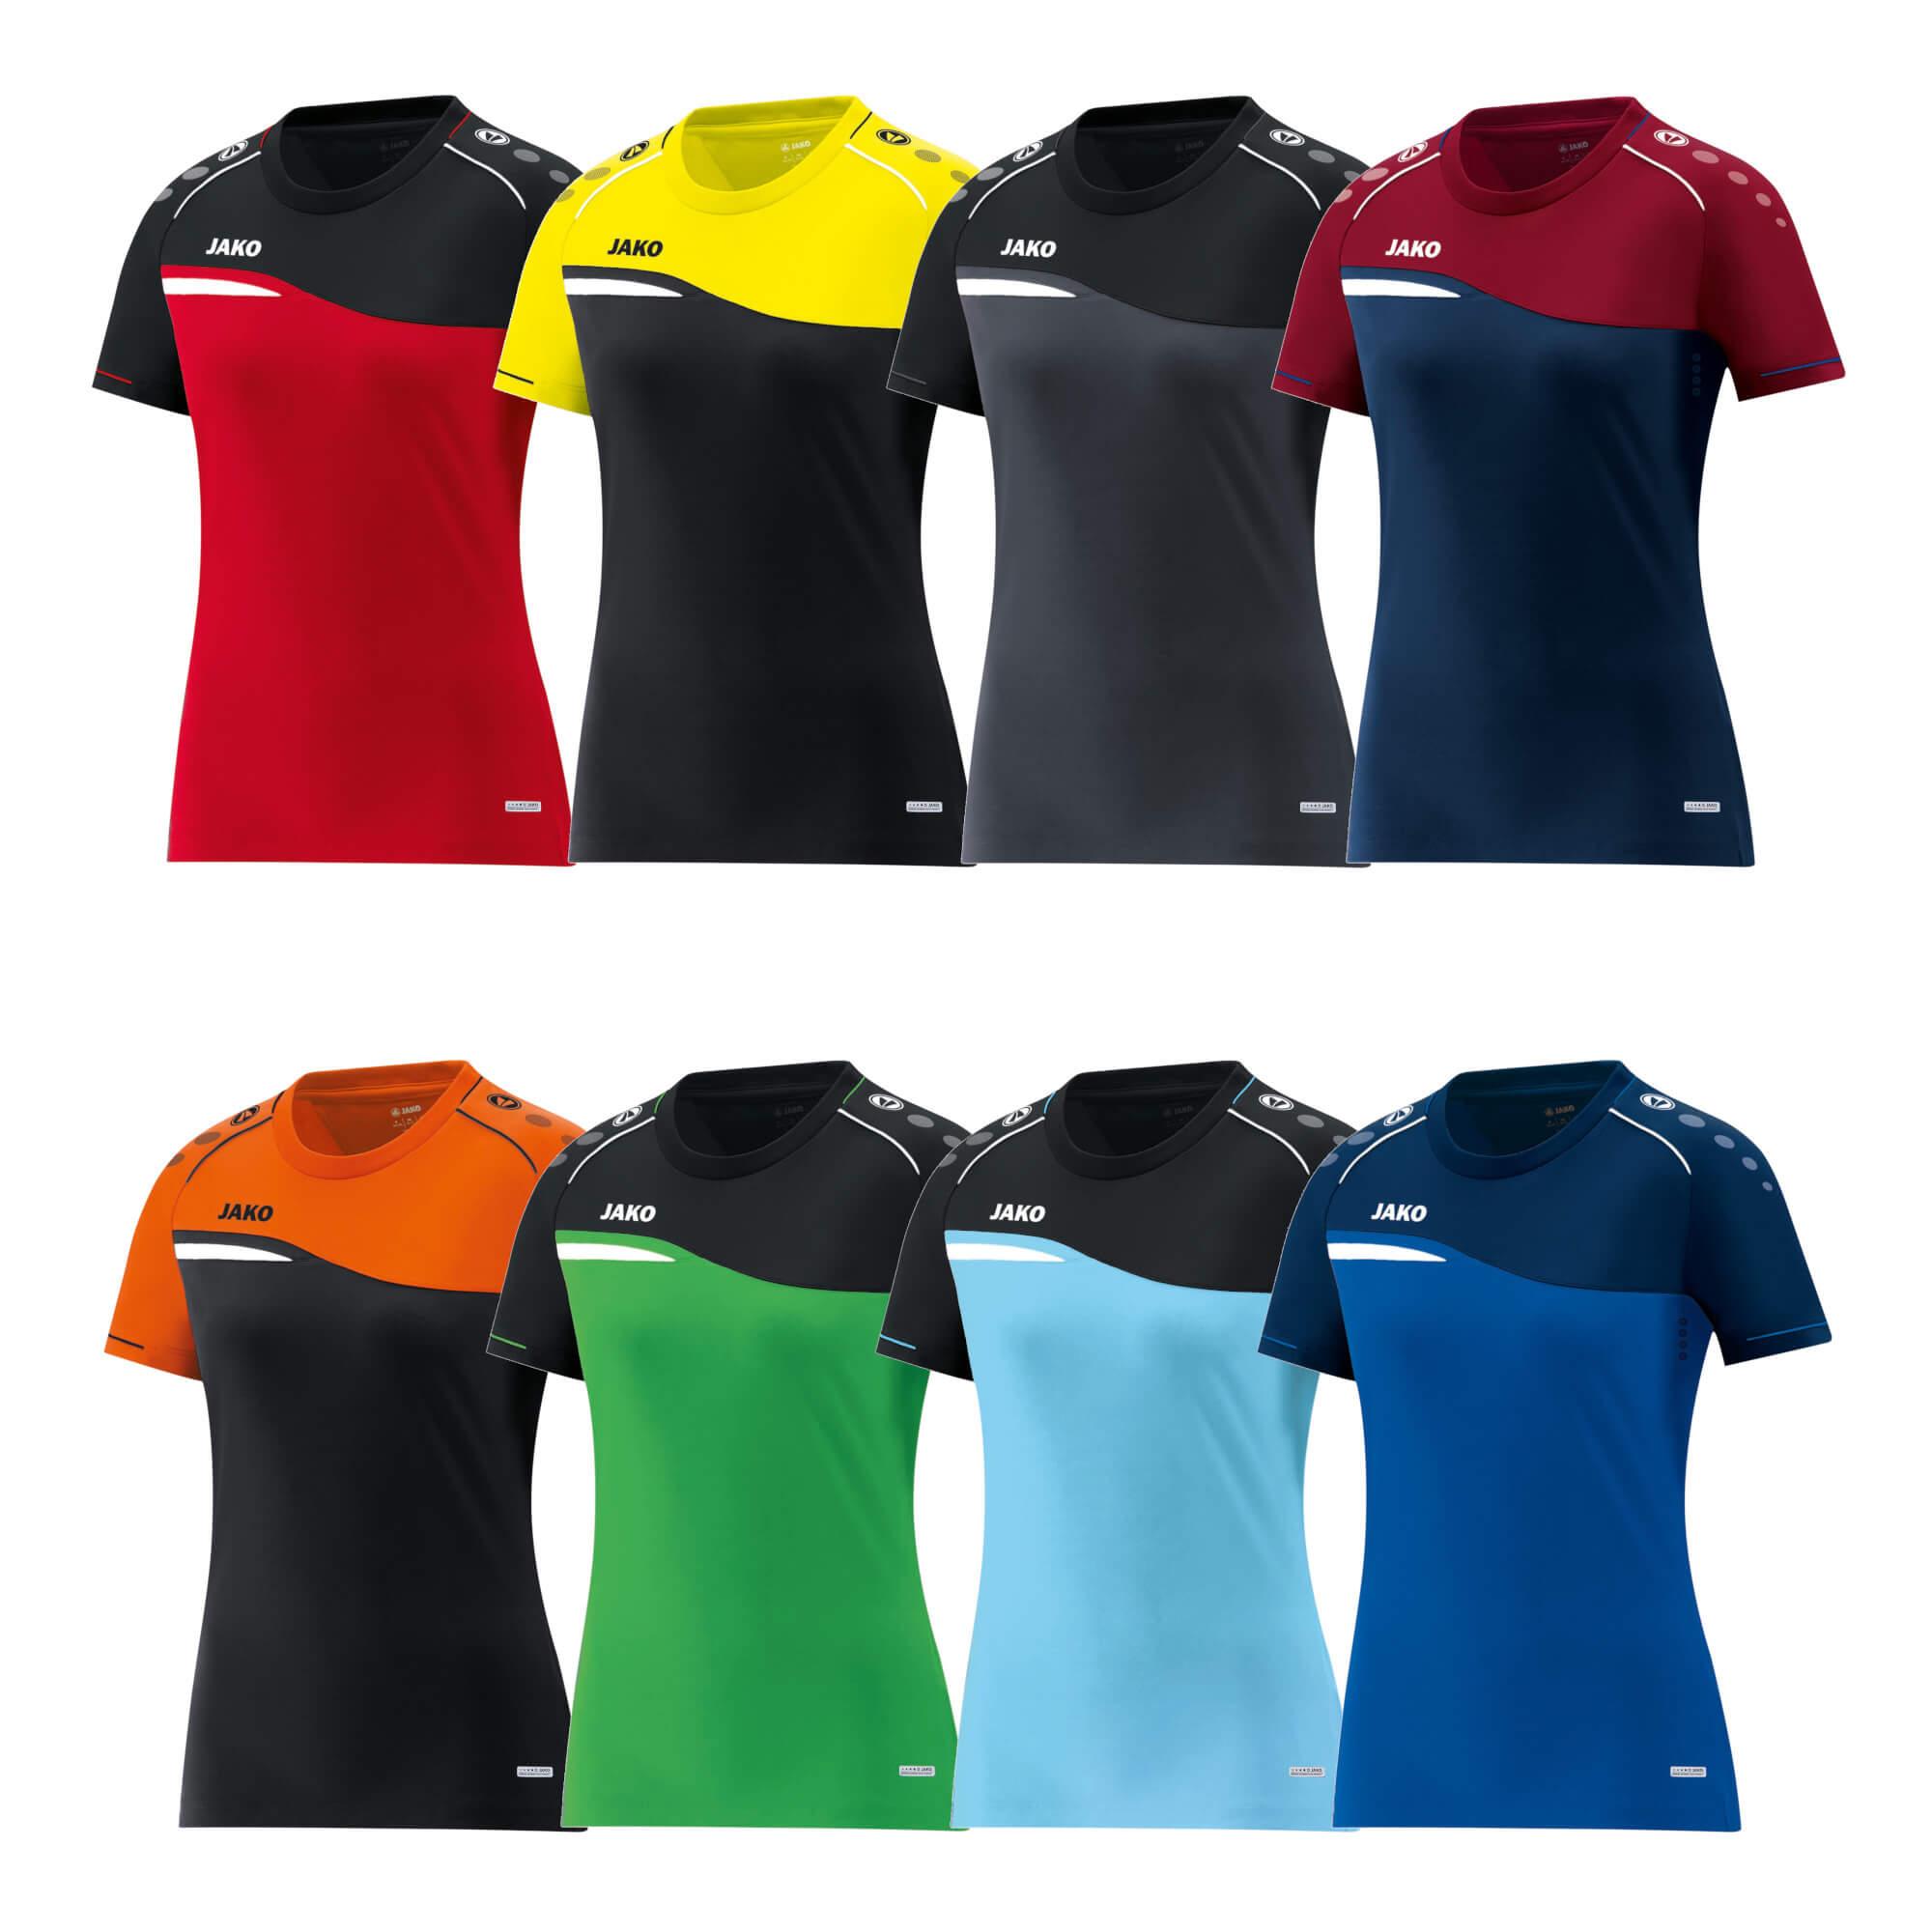 f61091fd08e438 JAKO Damen T-Shirt Competition 2.0 6118   Vision sports Teamsportbedarf